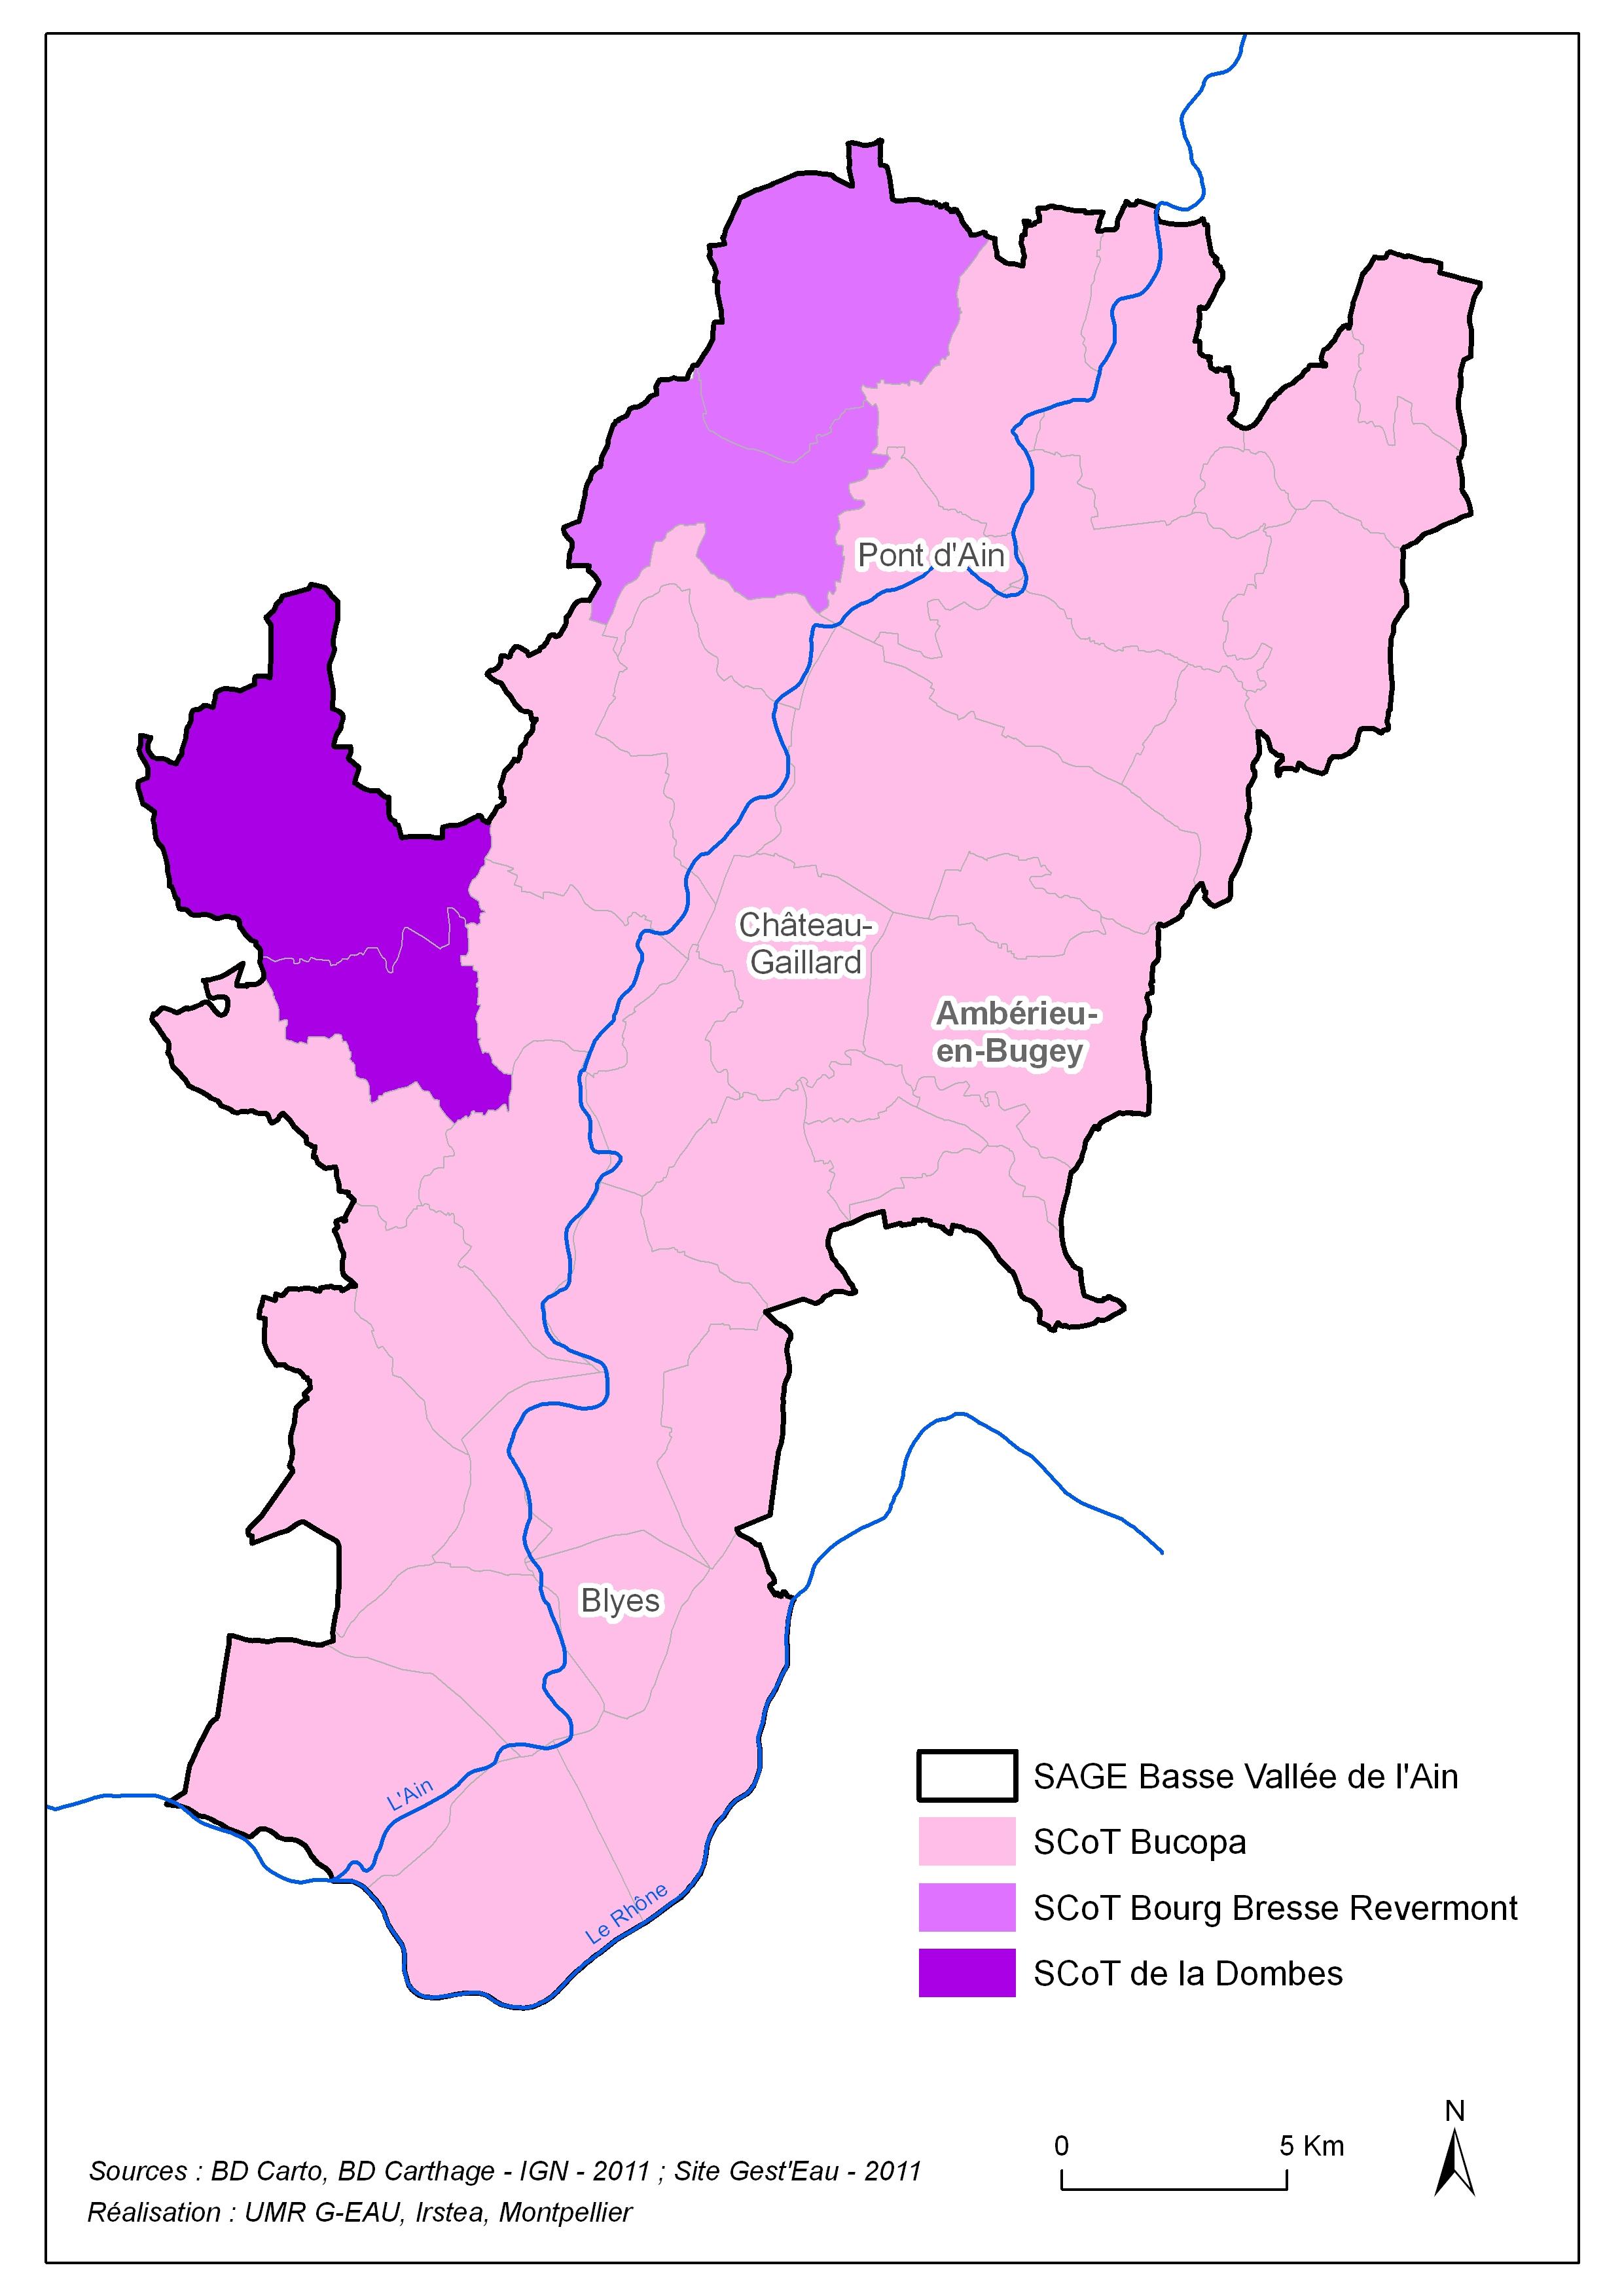 fceac9a89efb0c URL, http   journals.openedition.org vertigo docannexe image 12460 img-3.jpg